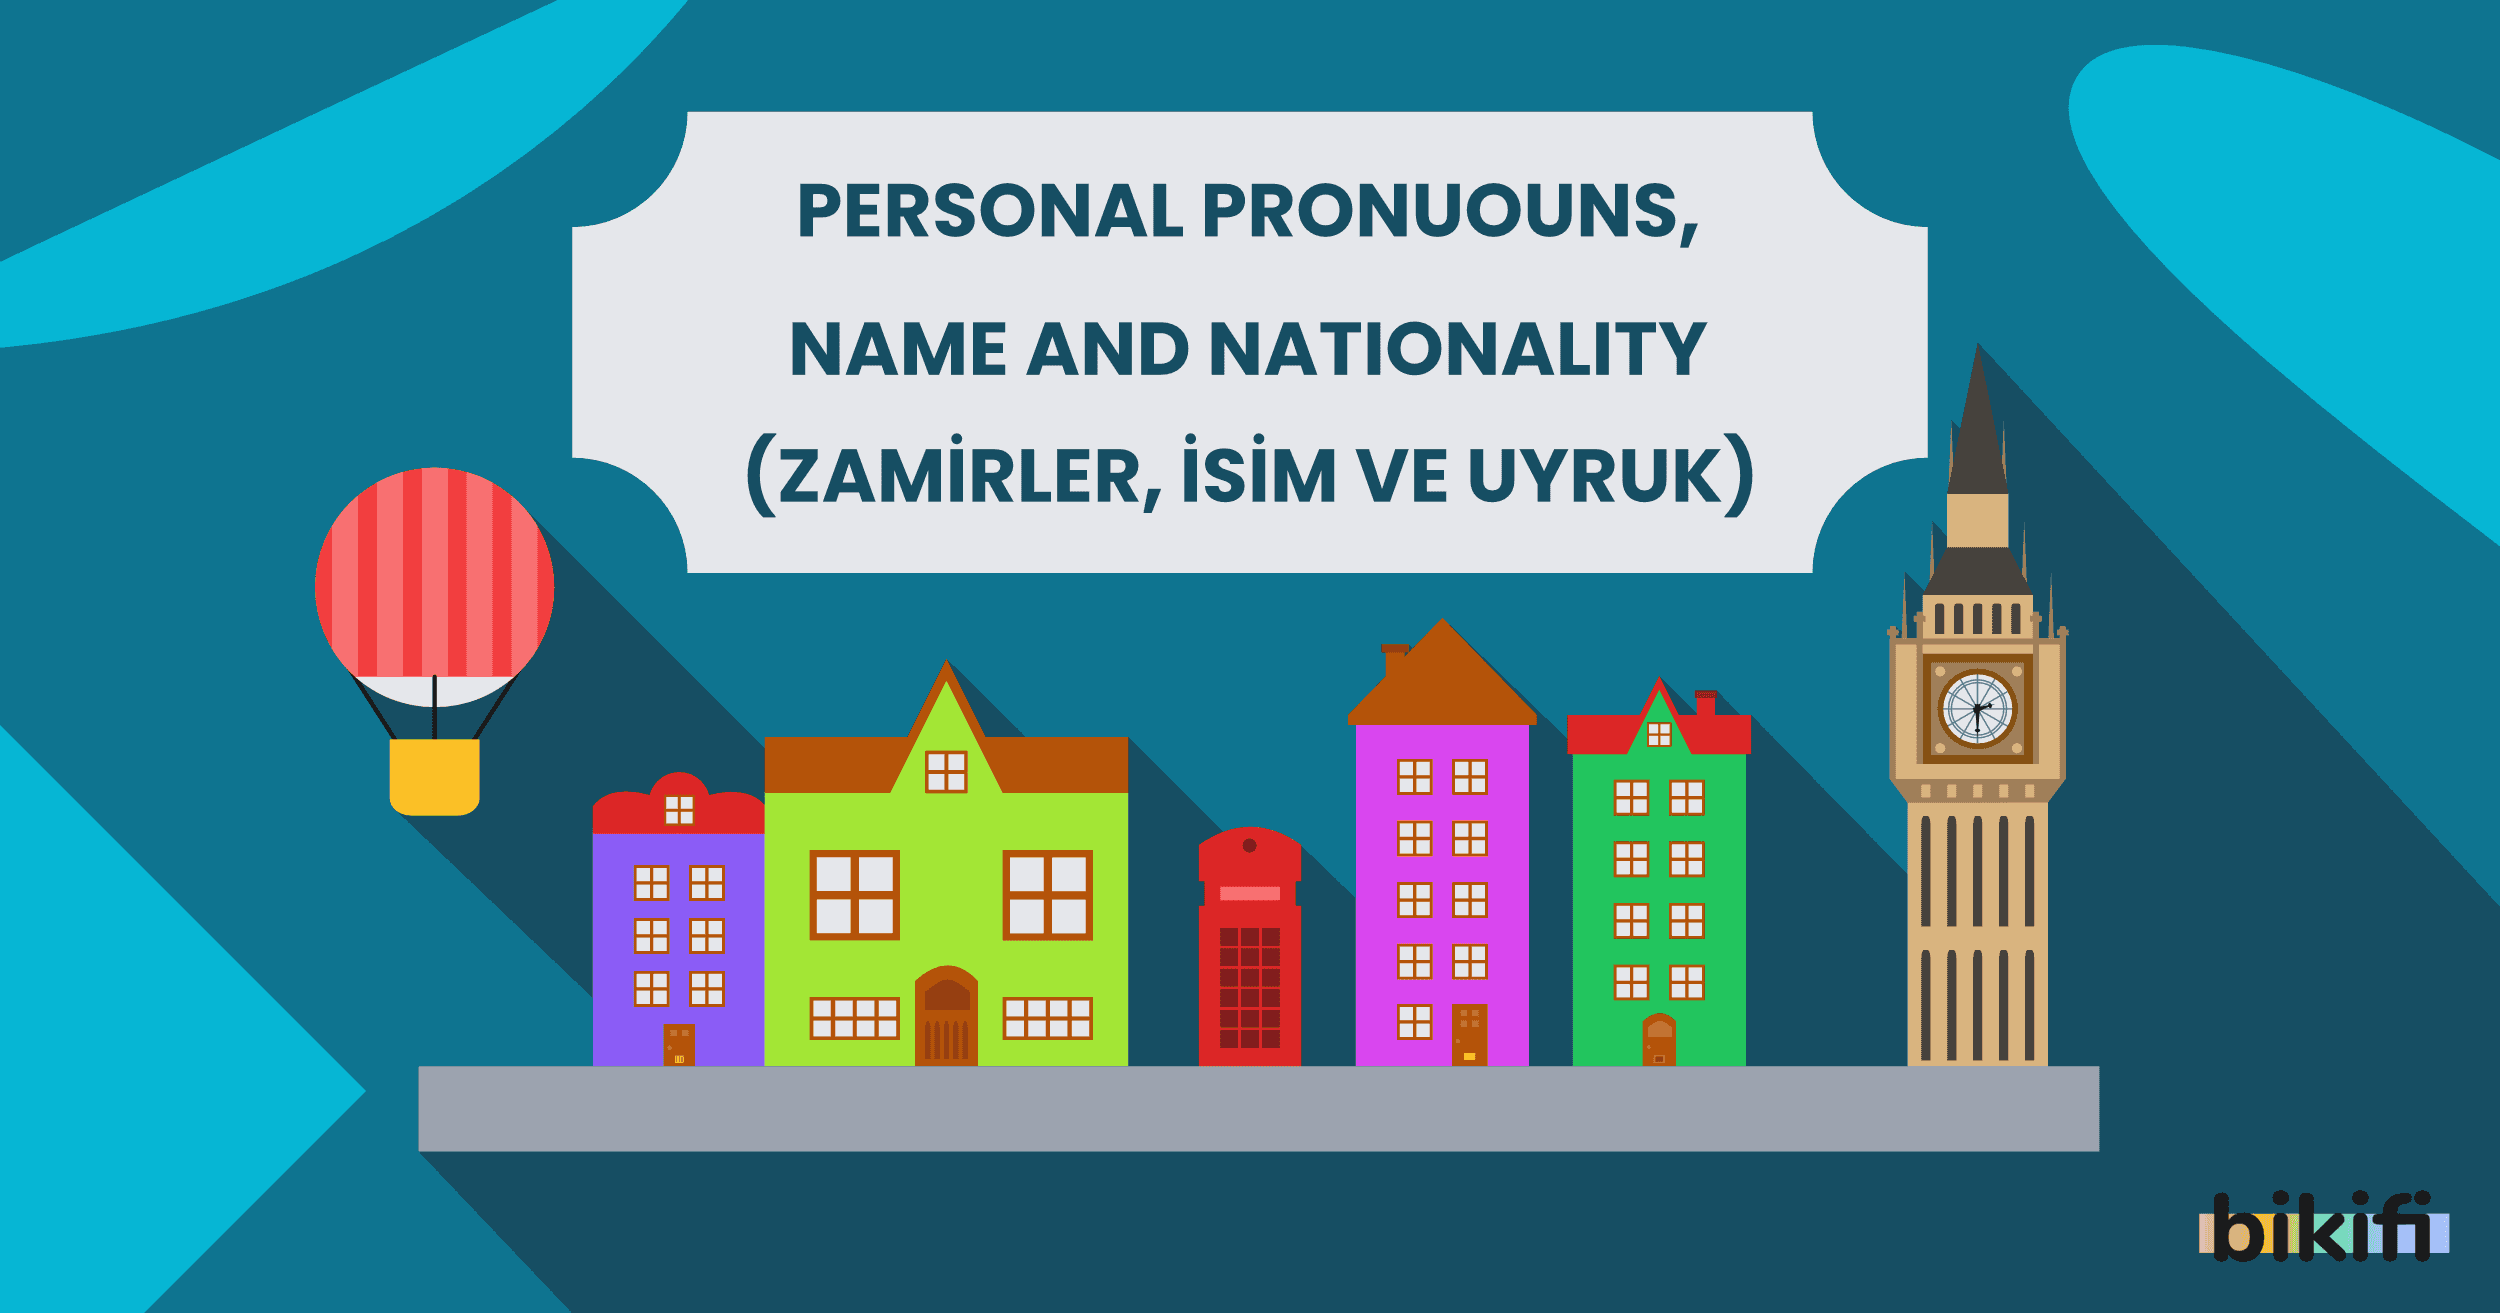 Personal Pronouns, Name and Nationality (Zamirler, İsim ve Uyruk)